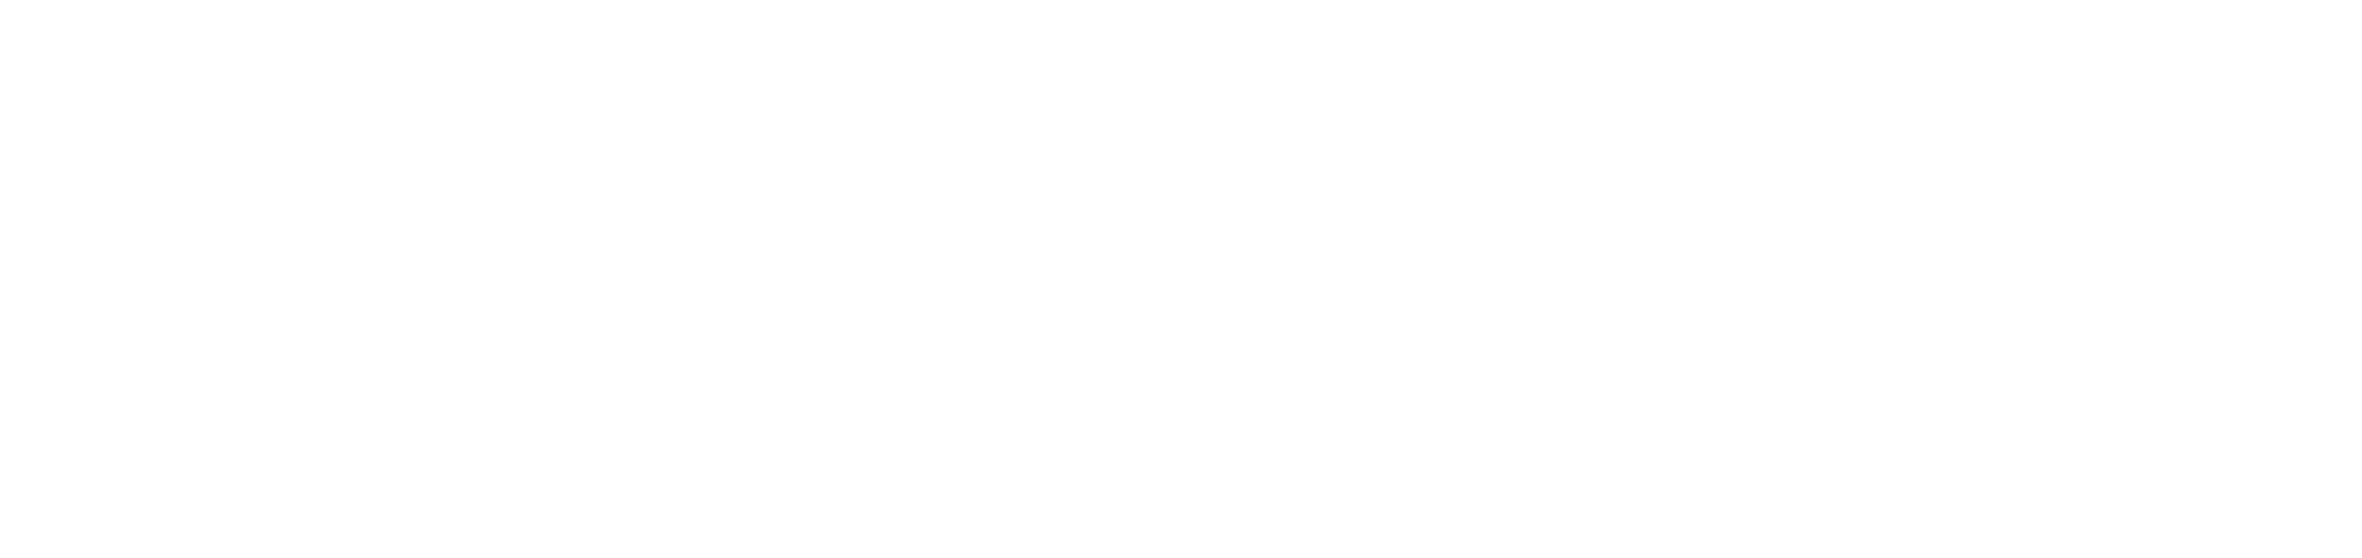 Foregenix-Logo-Horizontal-White-1